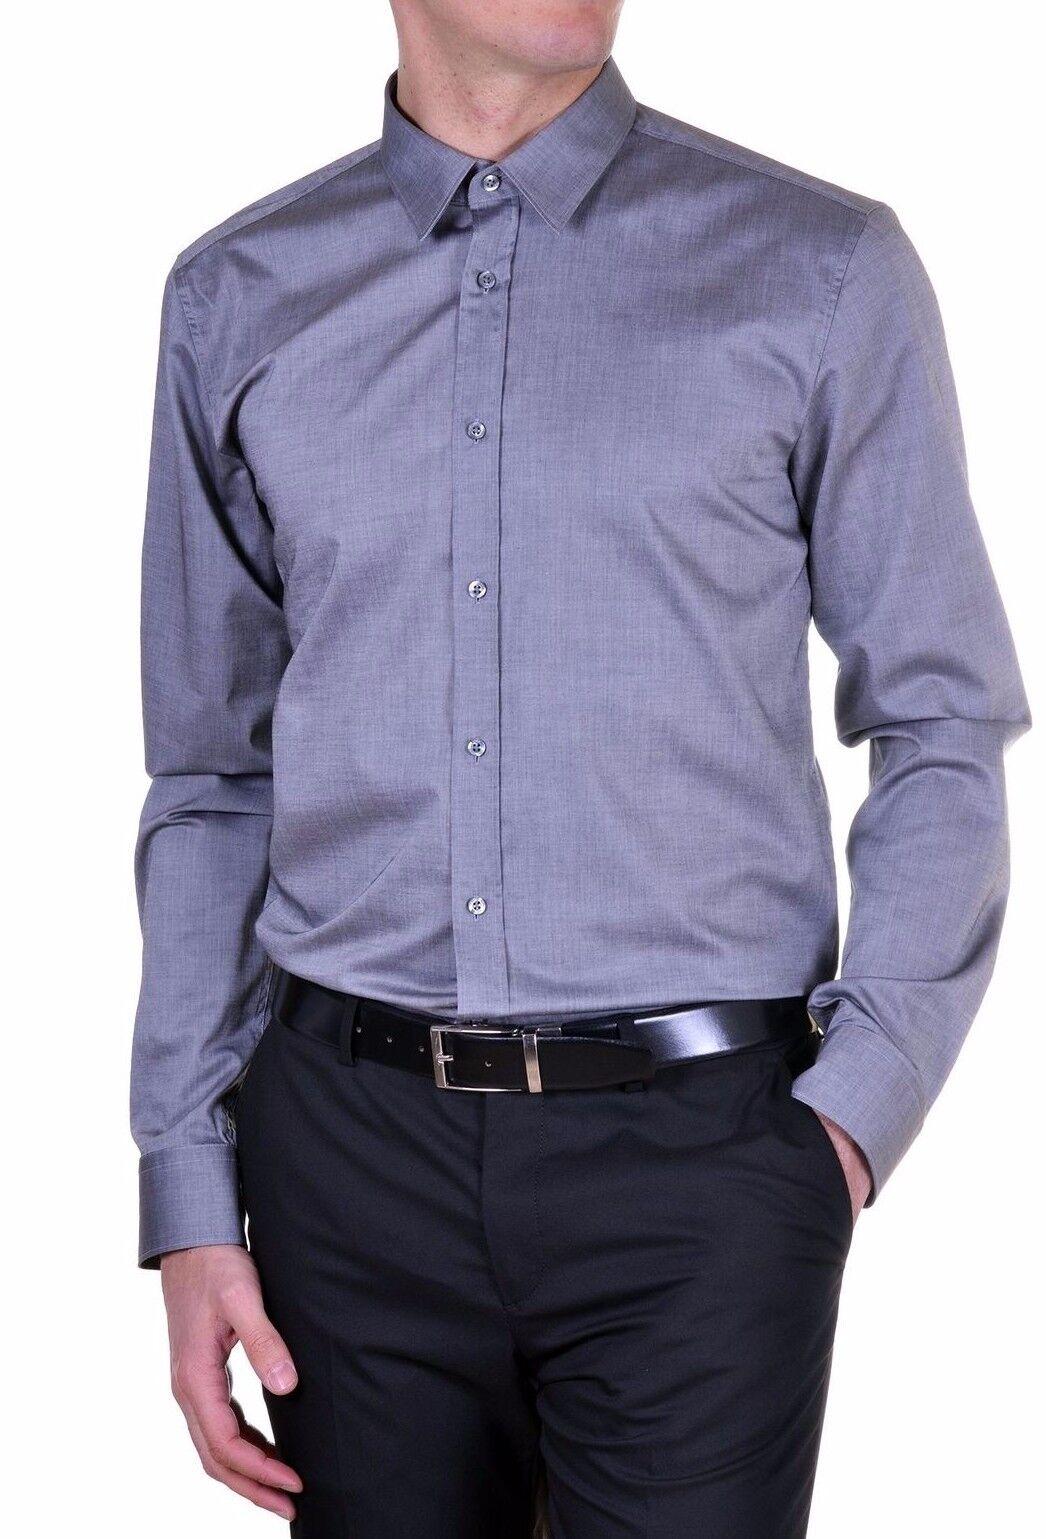 bce73faa2 Hugo Hugo Boss Red Label Men's Grey Elisha 10174539 Slim Button SK Fit  Front nbmnsq10428-Casual Shirts & Tops